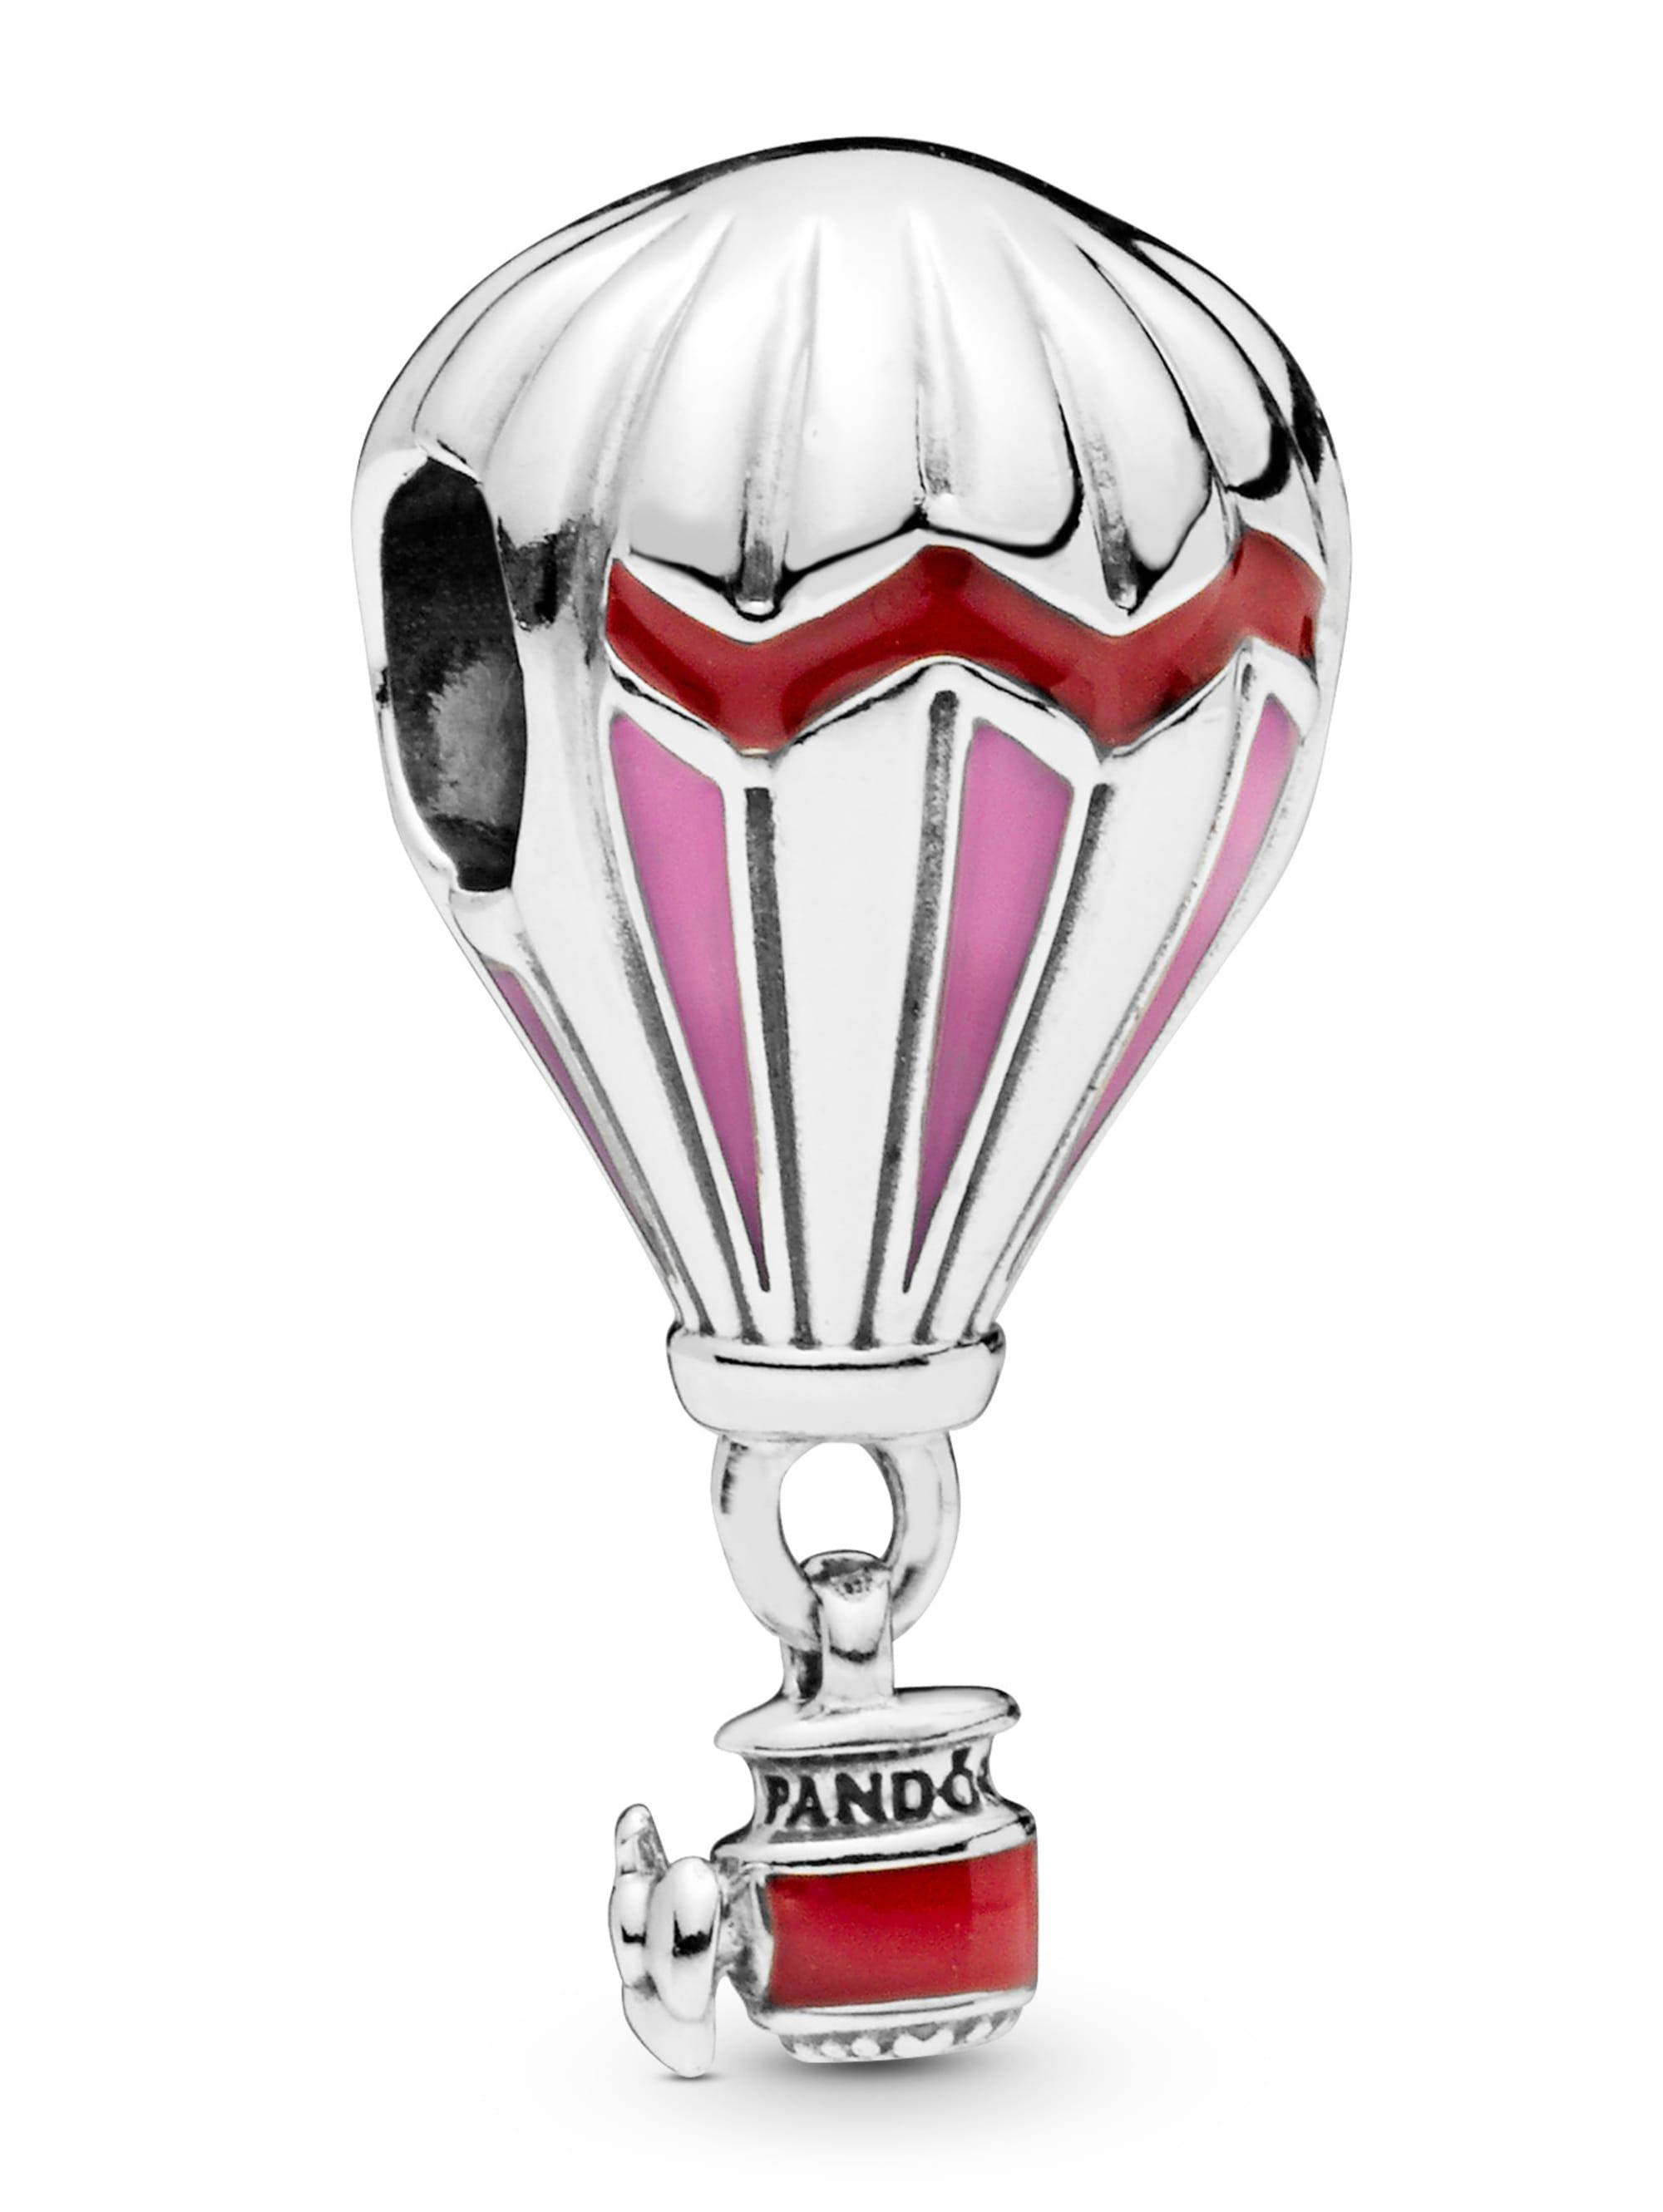 Pandora Charm -Roter Heißluftballon- 798055ENMX zdIsH